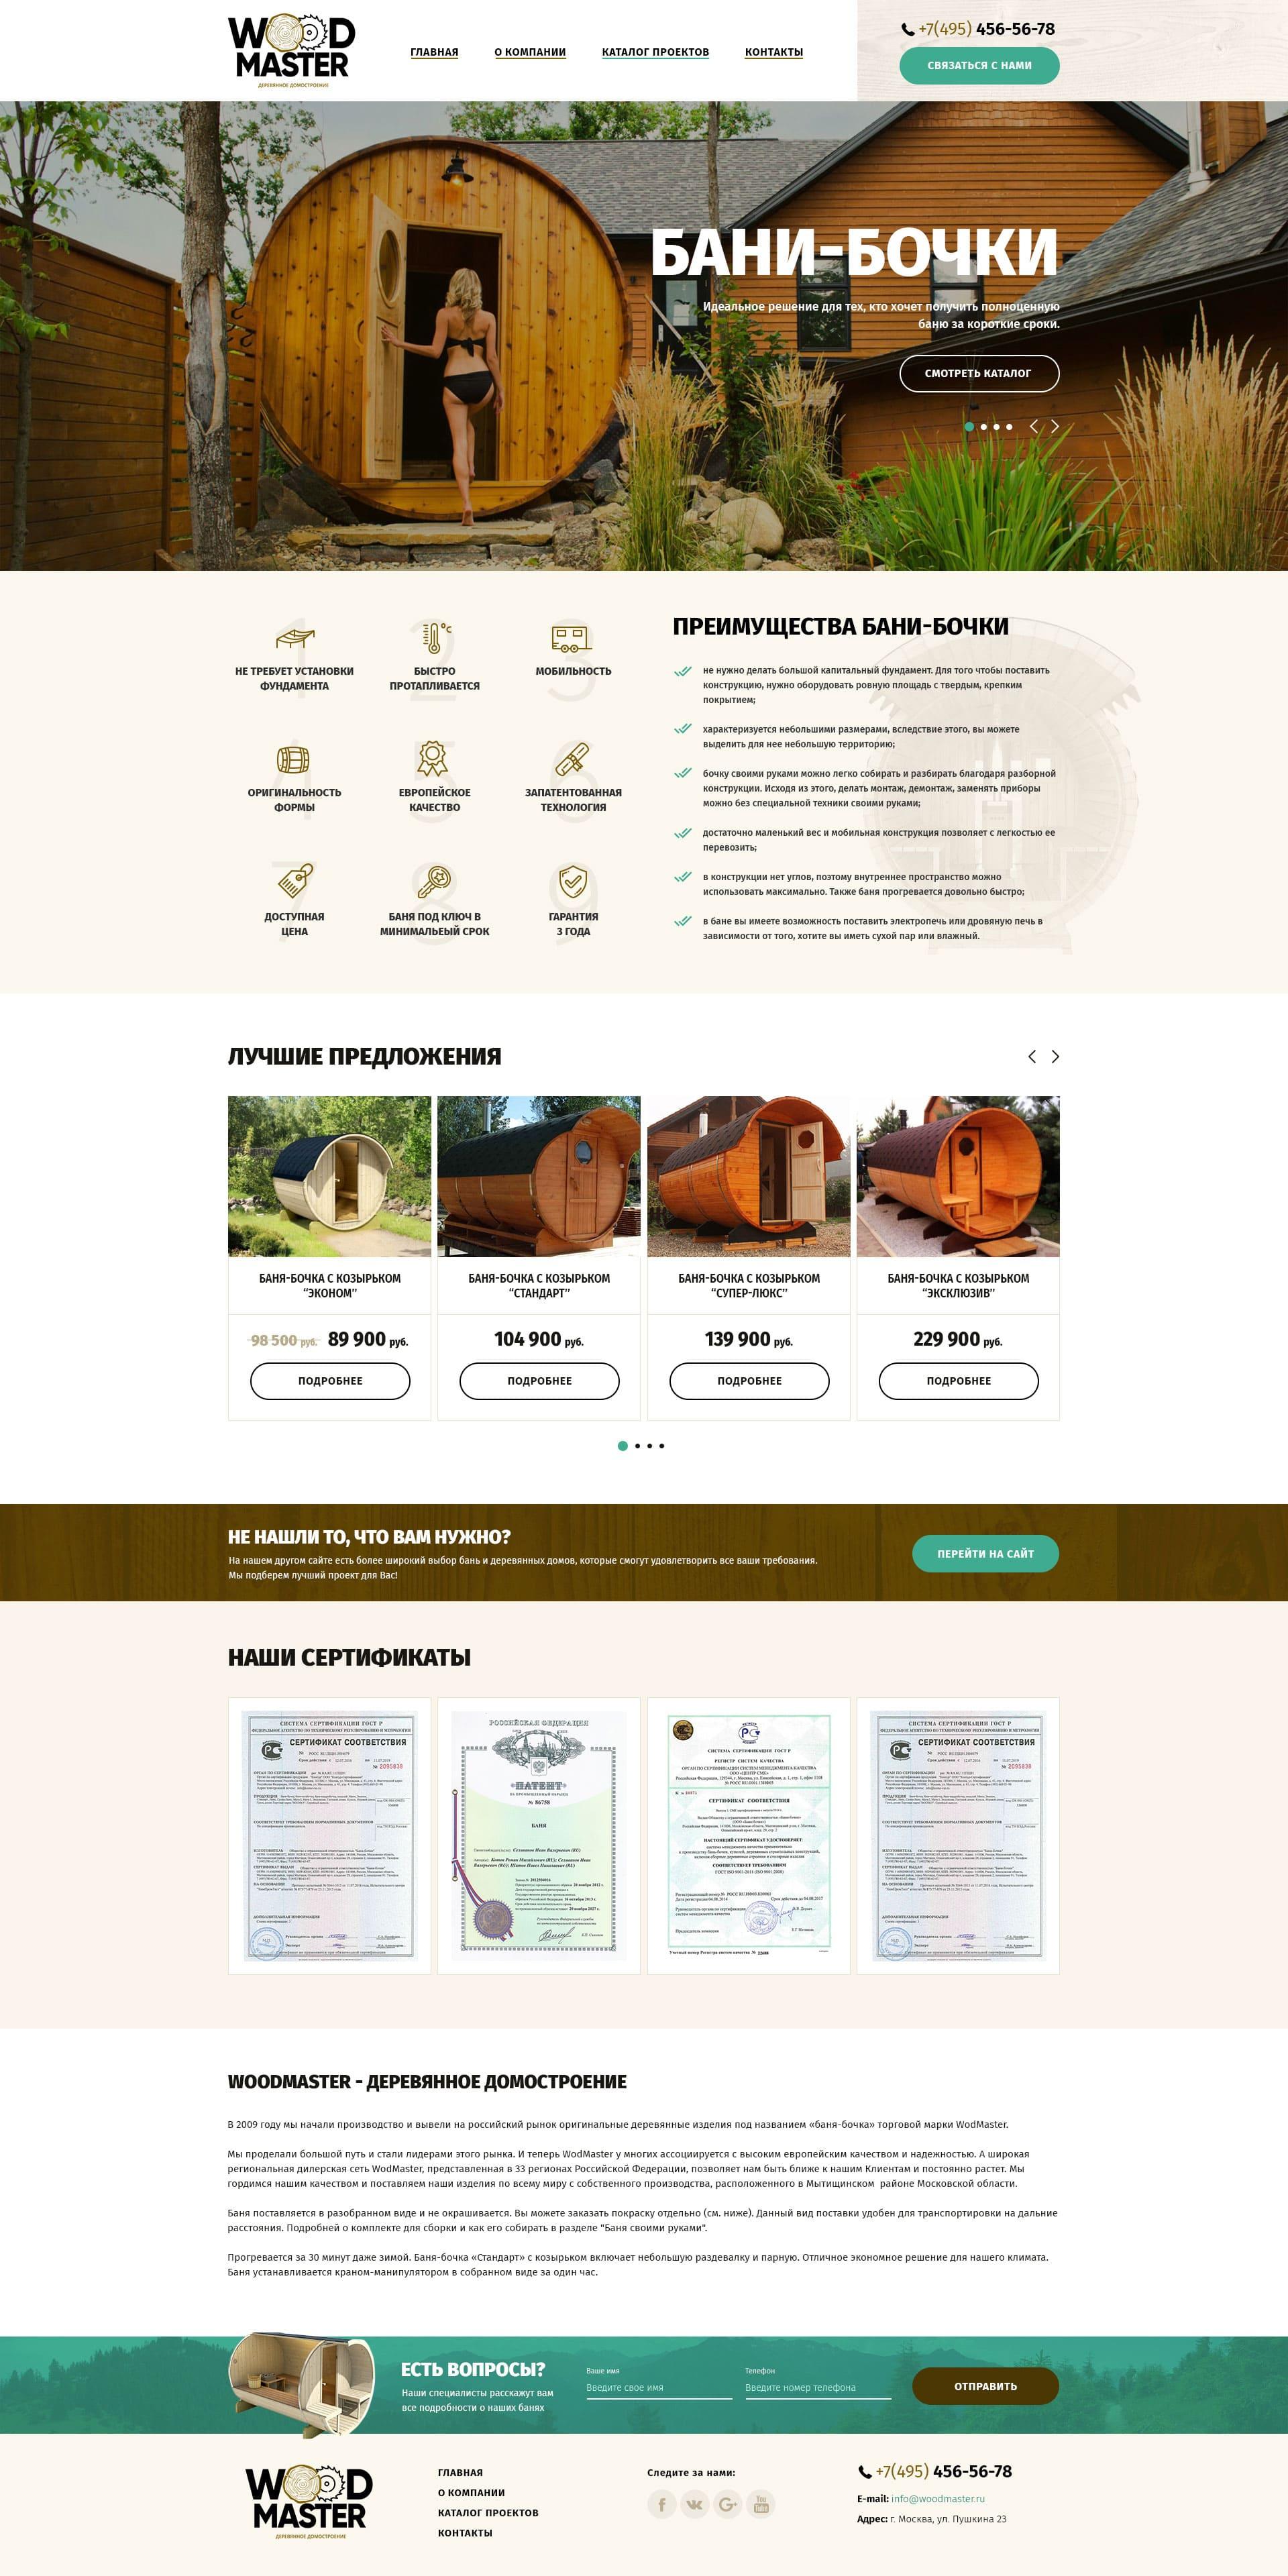 https://vladimir-alexandrov.com/wp-content/uploads/2017/10/Woodmaster_main.jpg